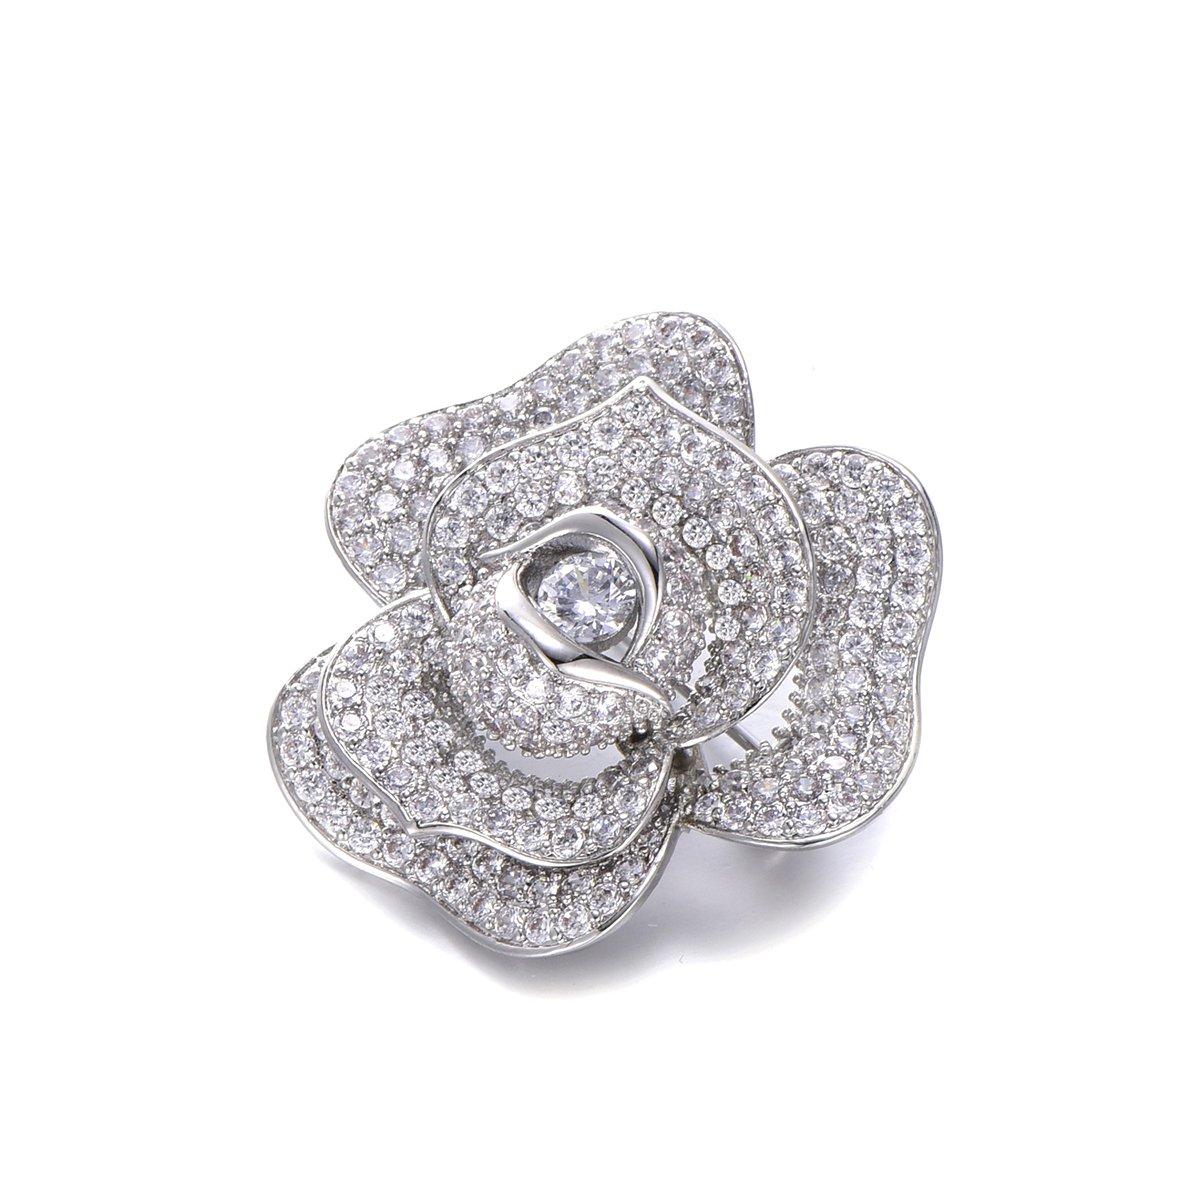 Flower Brooch Pins for Women,Dazzling Rhinestone Brooch for Brides Copper Vintage Crystal Brooch Girls CZ Brooch for Wedding,Party (Silver Plated Flower Brooch) by YOYOMA (Image #4)